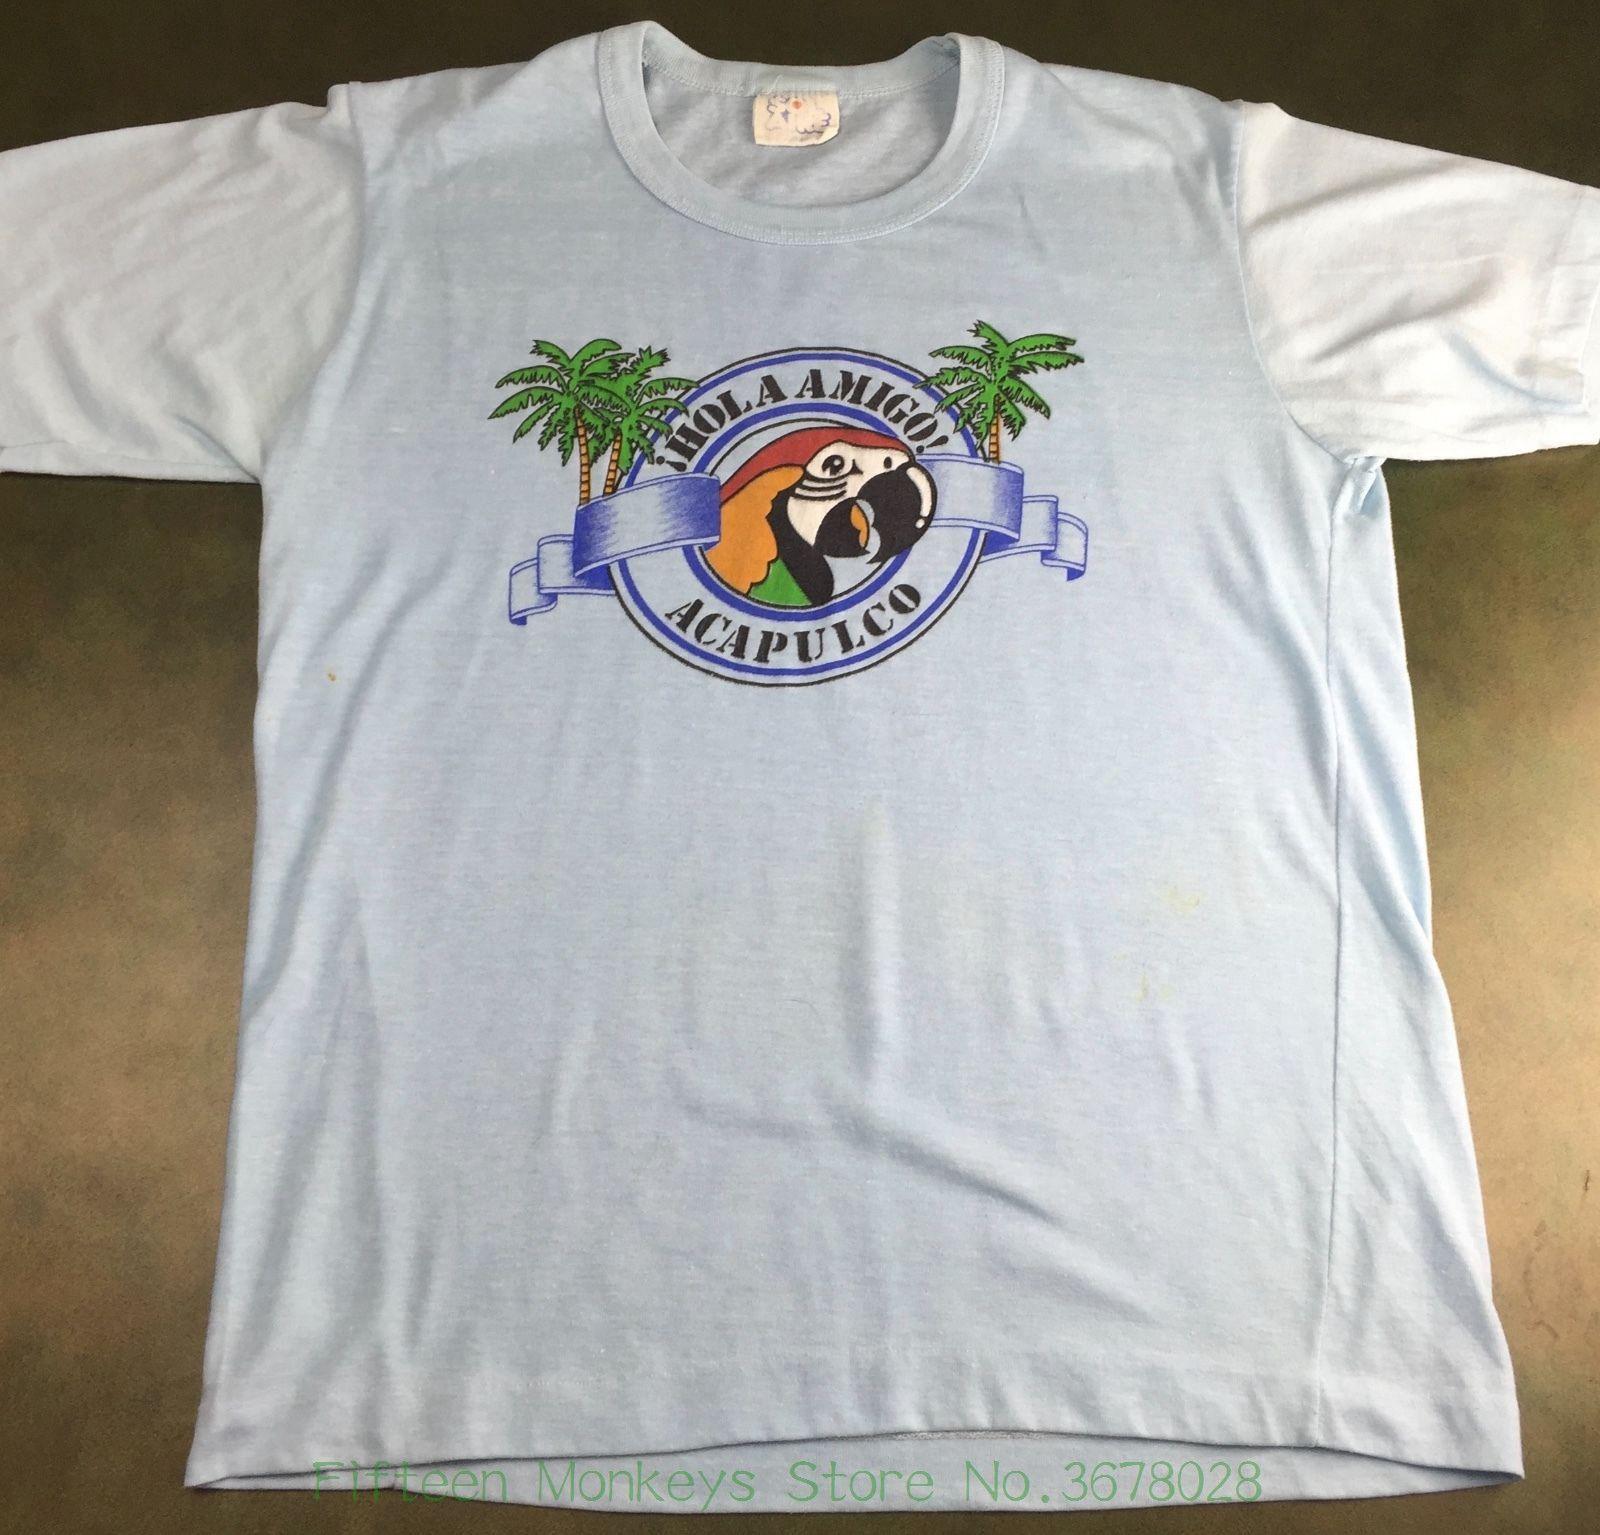 b17495b0f Original Tops Novelty Vintage Mens M / L 70s 80s Acapulco Mexico Hola Amigo  Parrot Souvenir T Shirt Canada 2019 From Fifteenmonkeysstore, ...